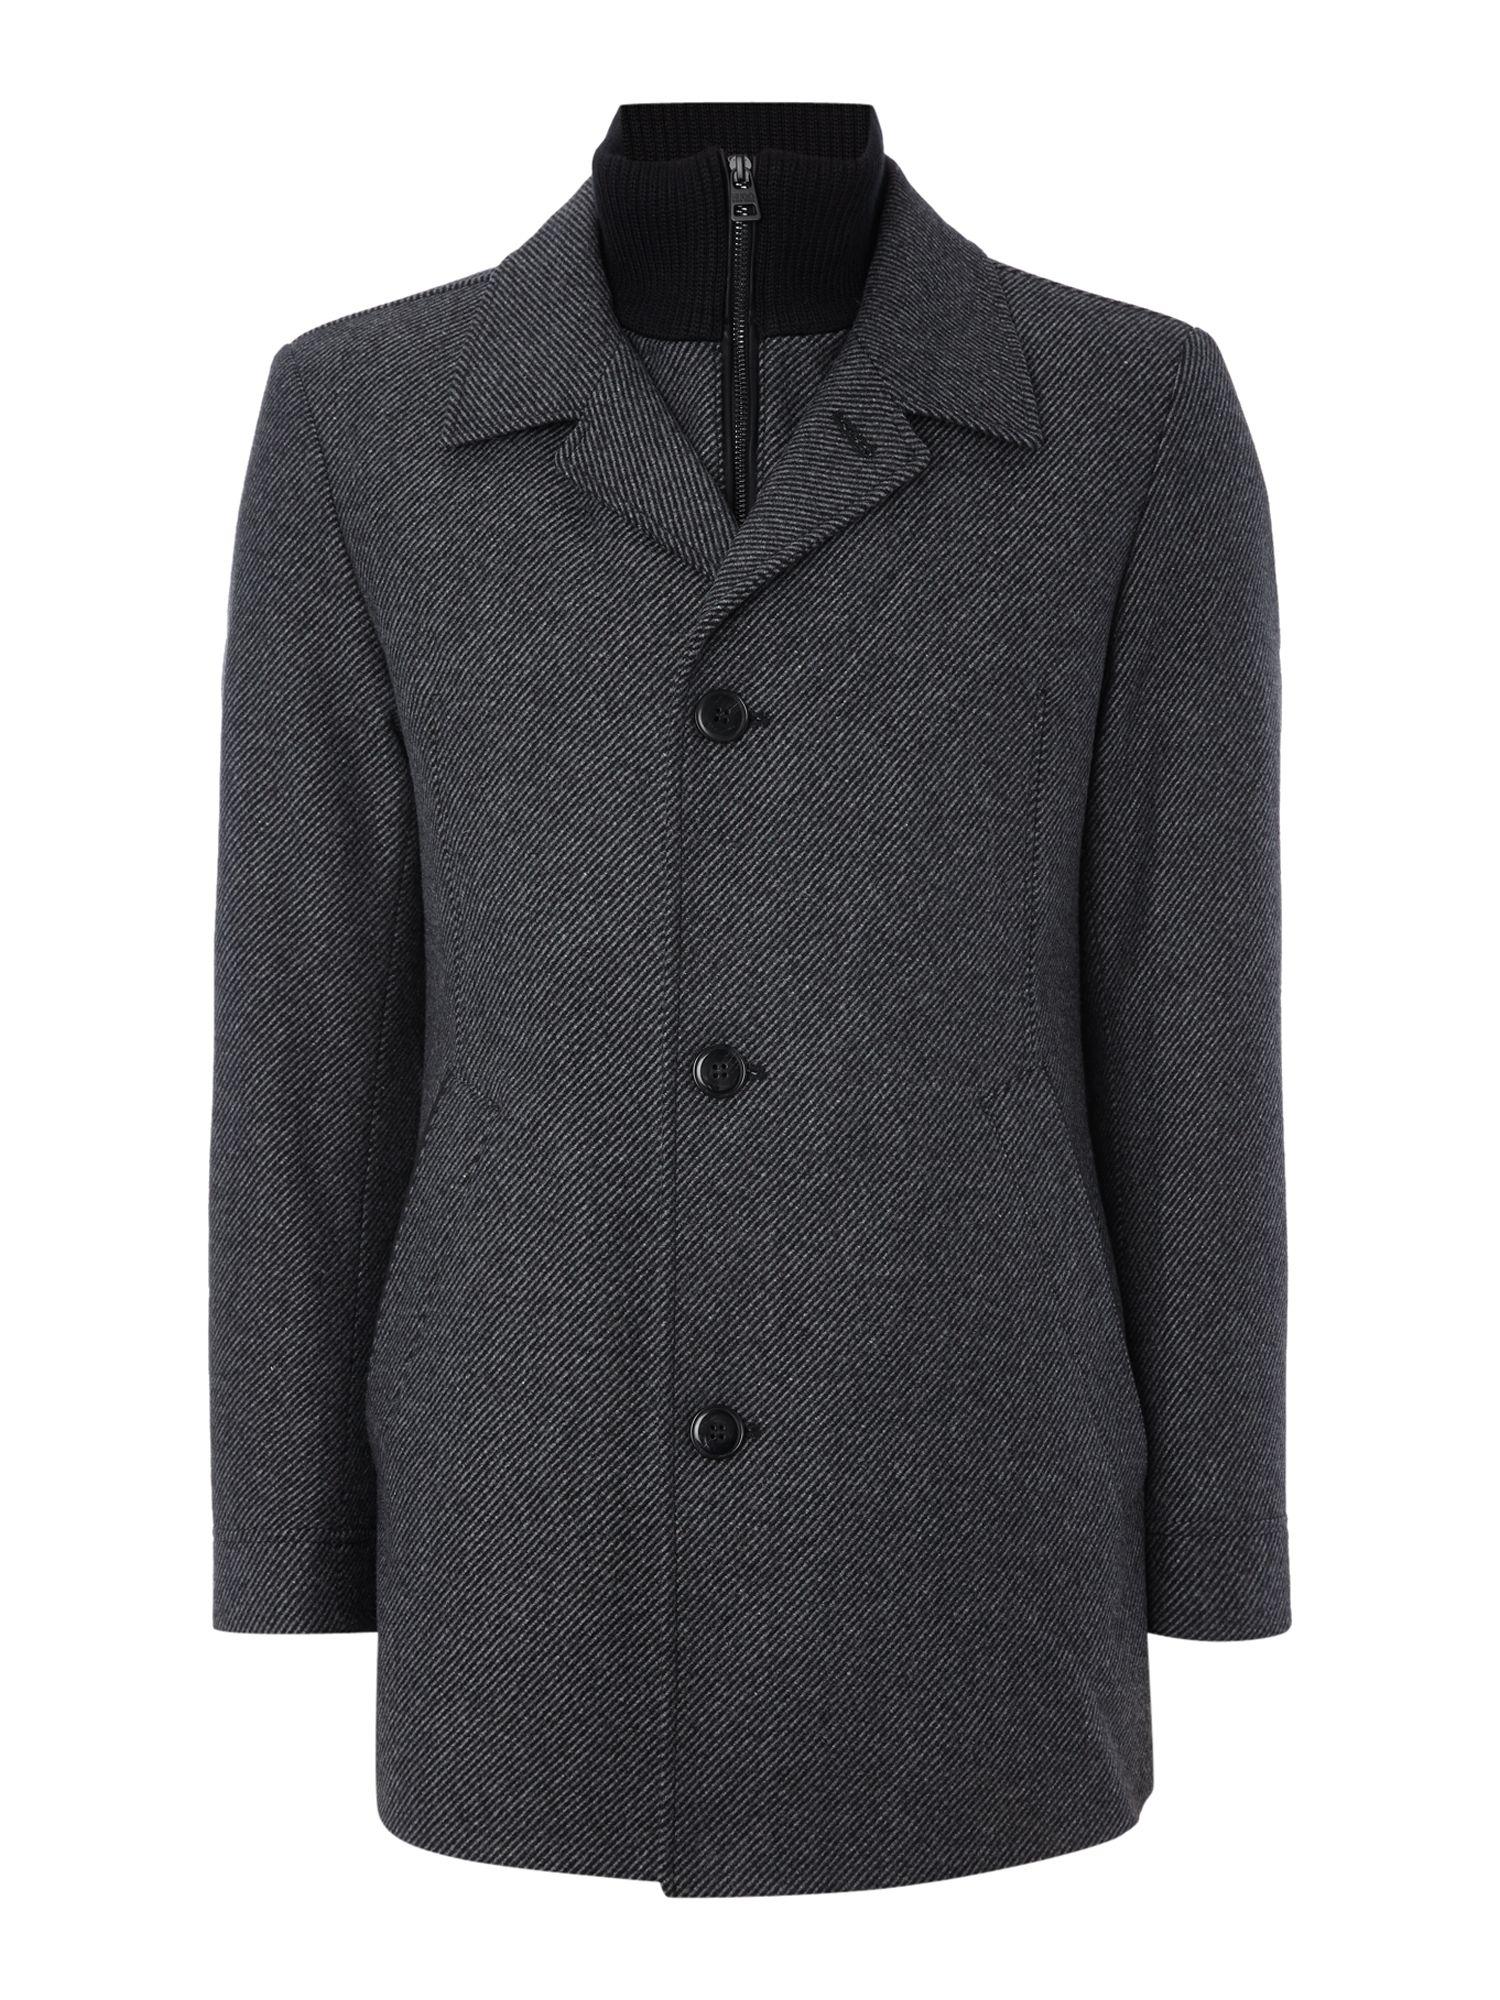 hugo barelto gilet insert coat in gray for men lyst. Black Bedroom Furniture Sets. Home Design Ideas